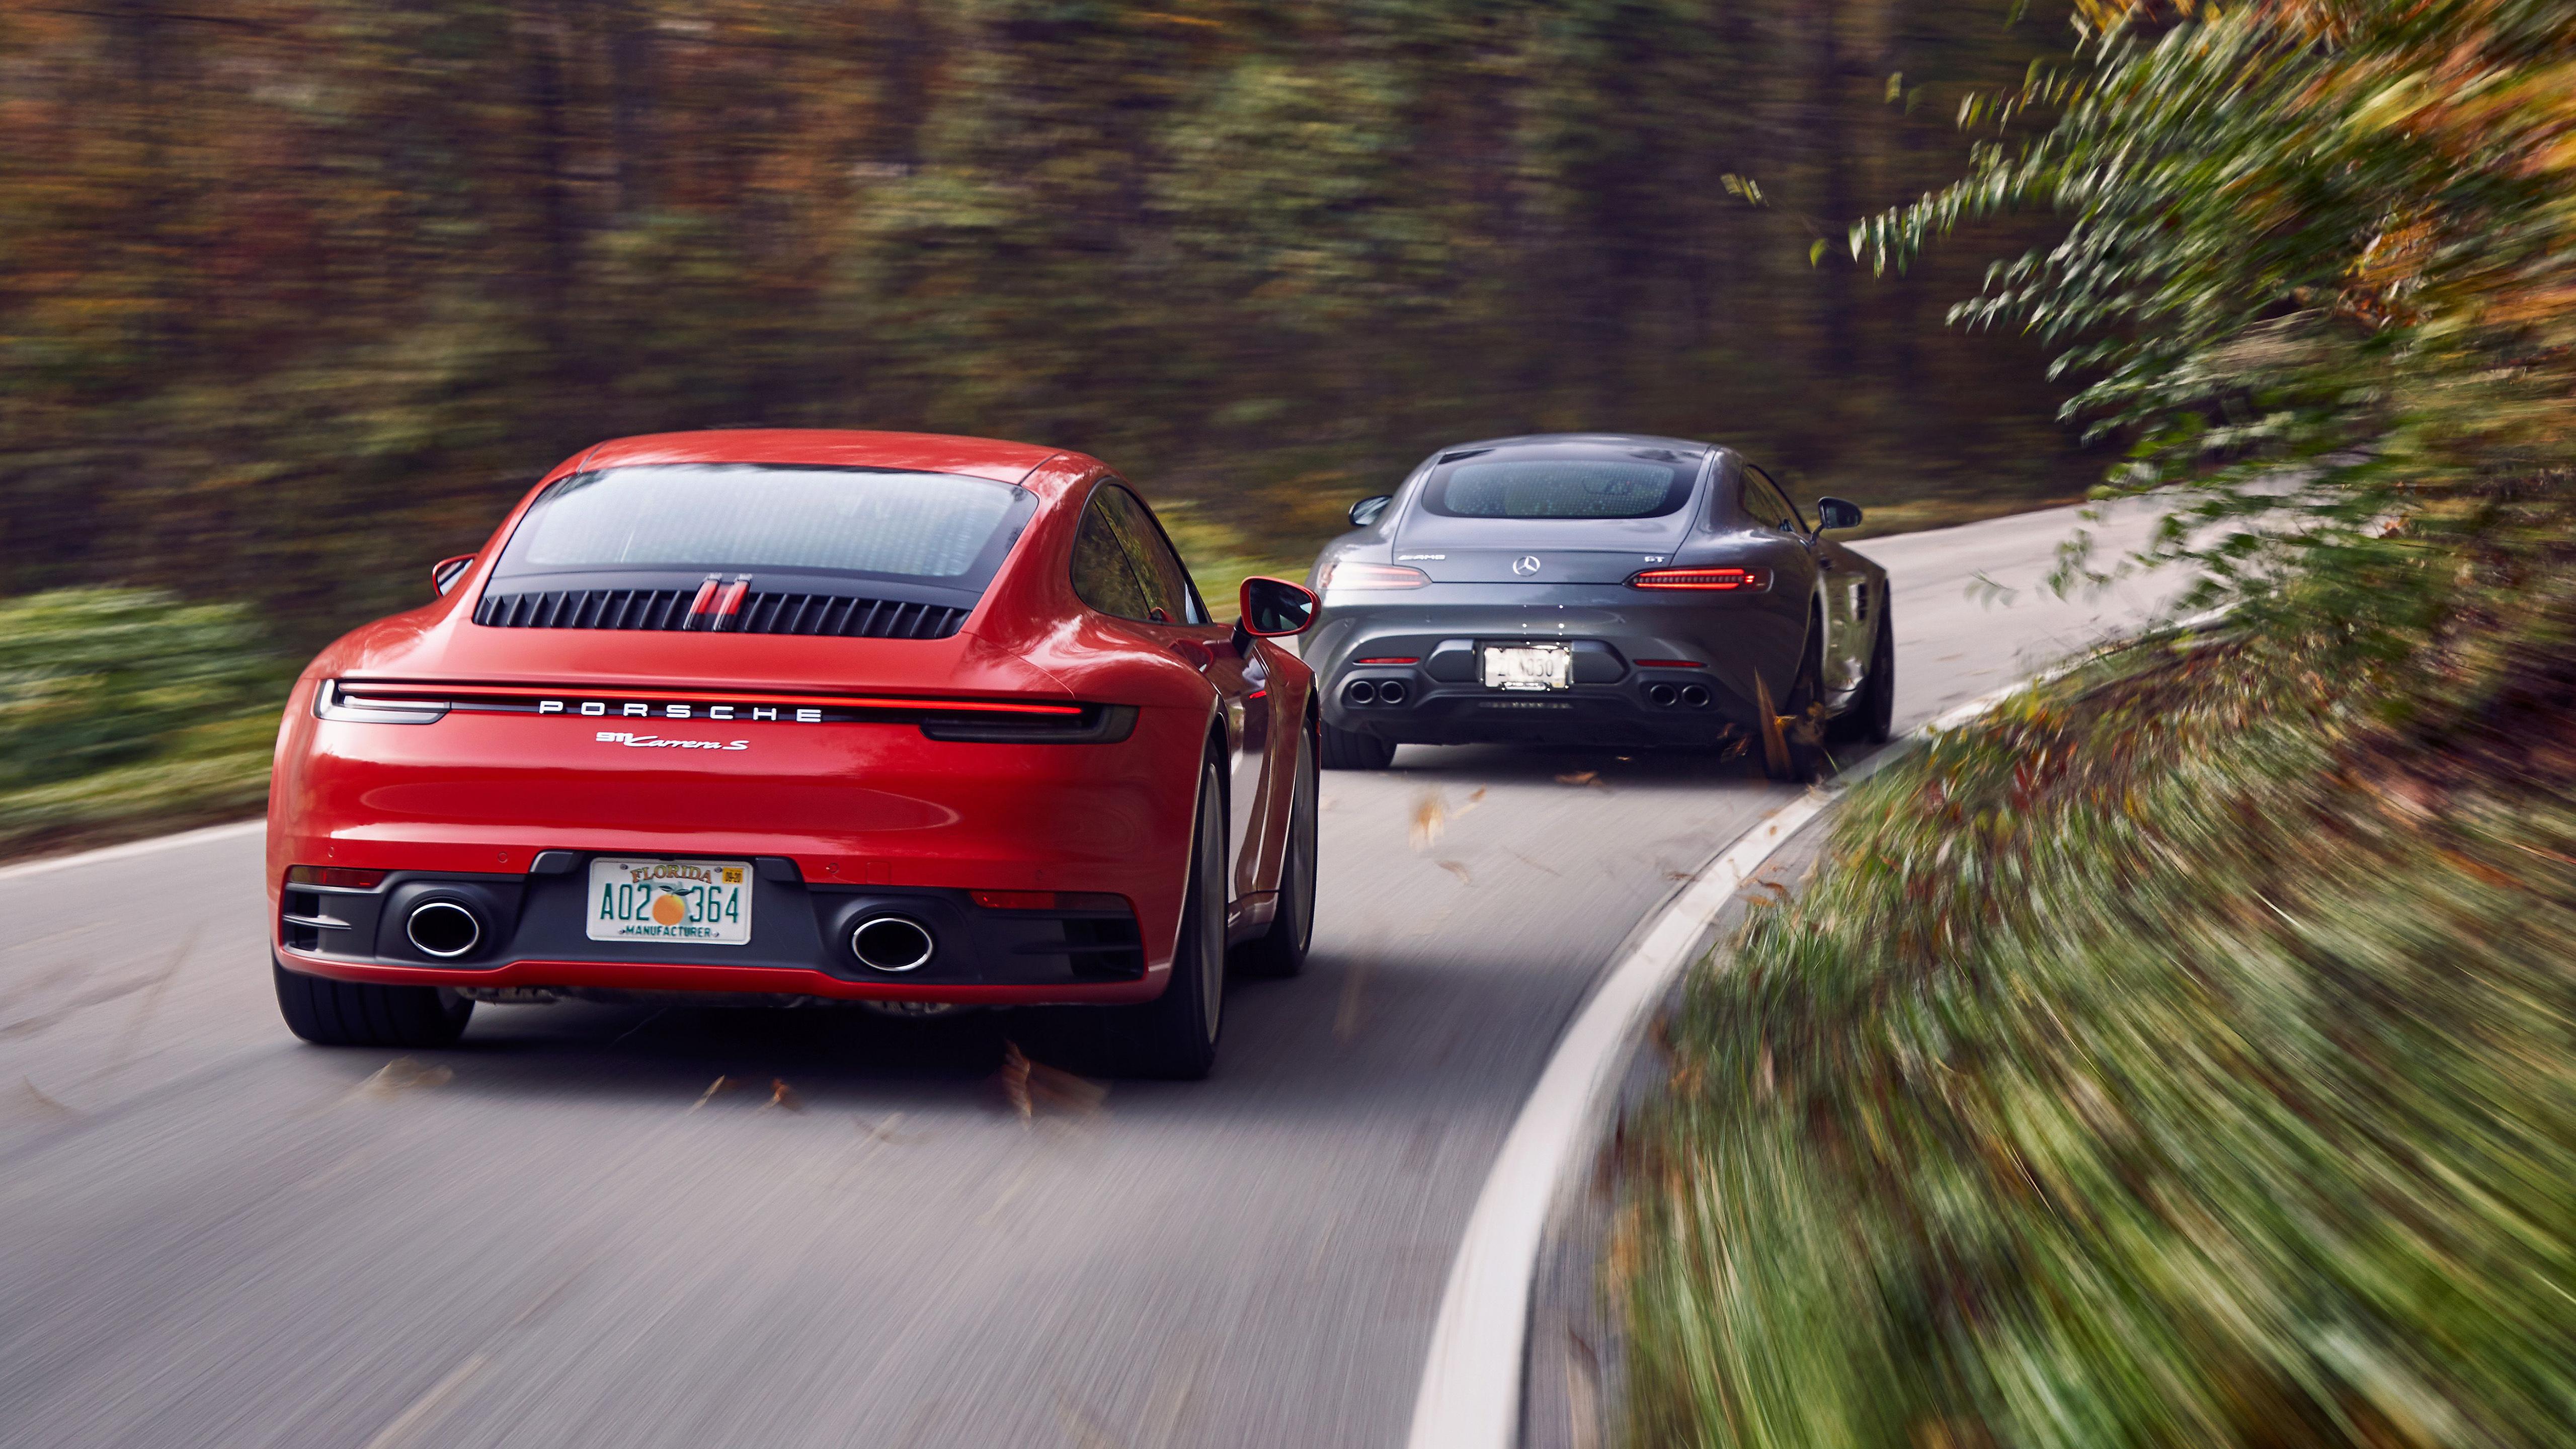 2020 Mercedes AMG GT and 2020 Porsche 911 Carrera S 5K 2 Wallpaper 5120x2880